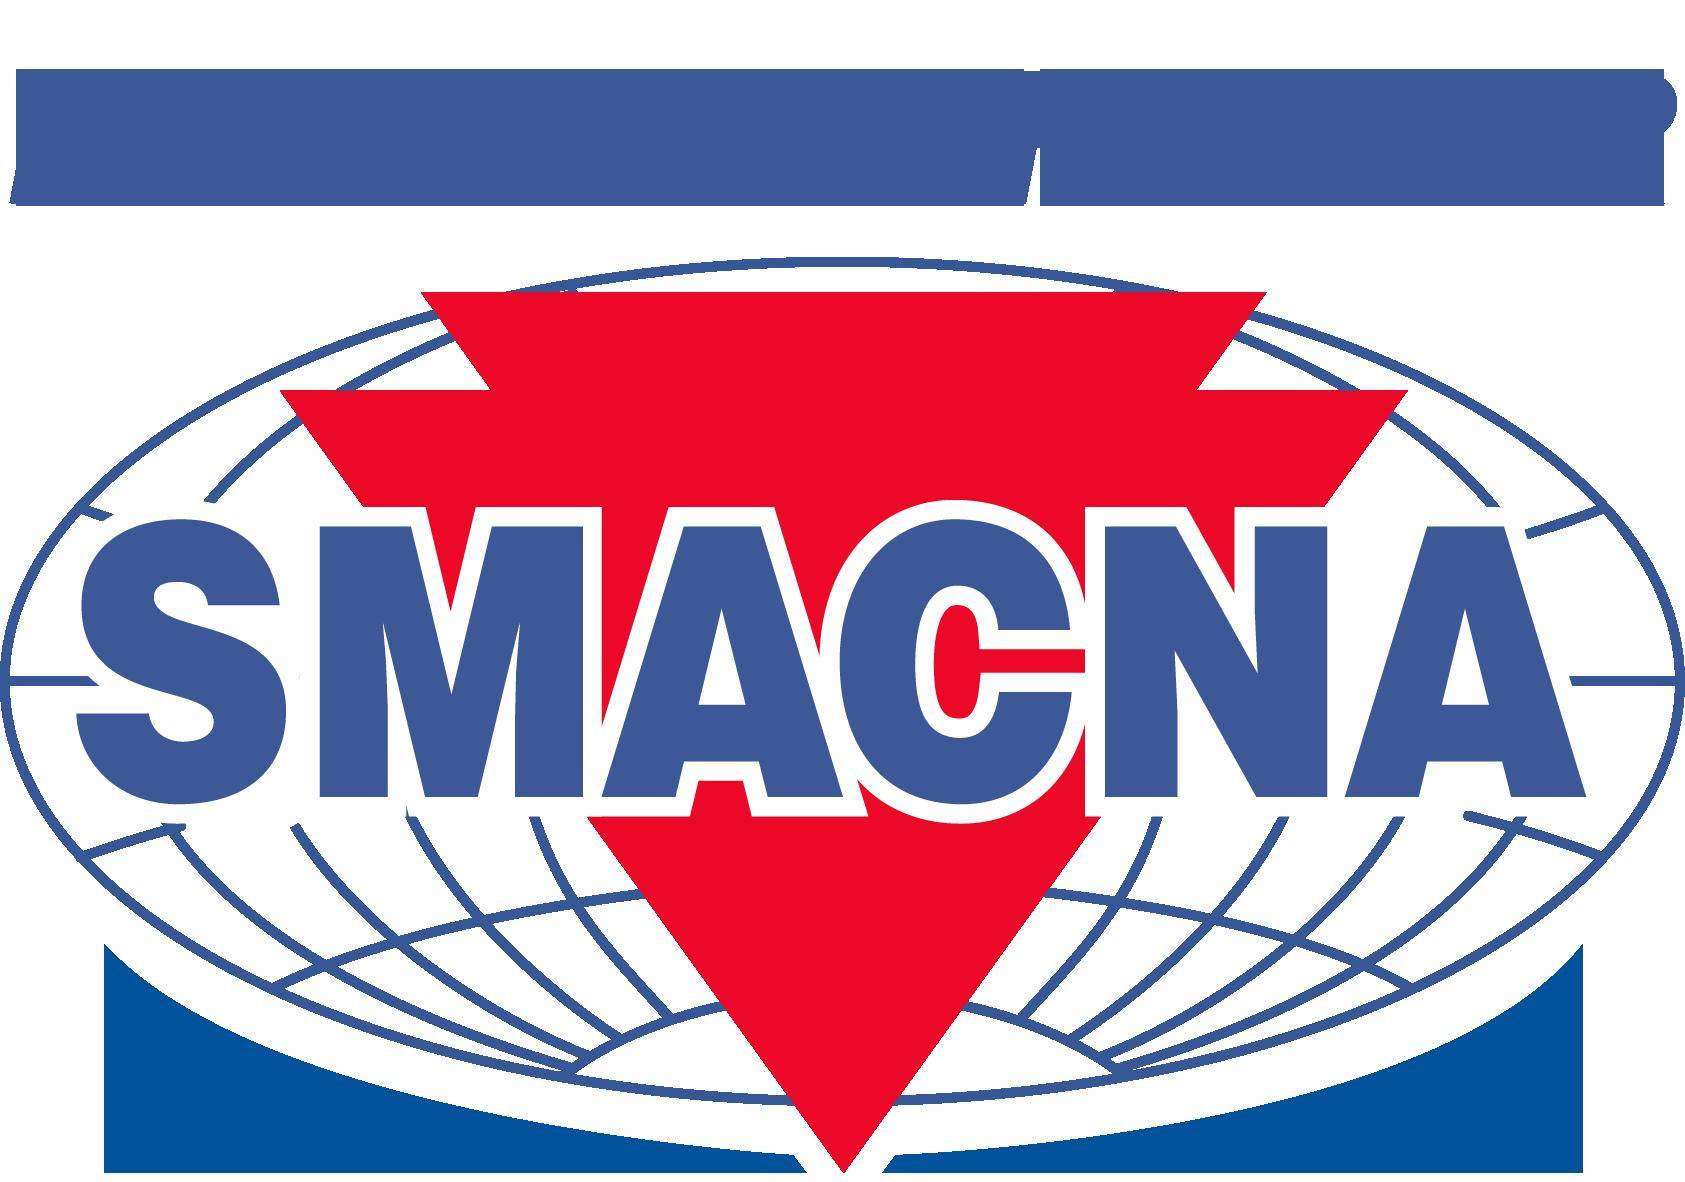 SMACNA-BlueLogoClearGlobe.png